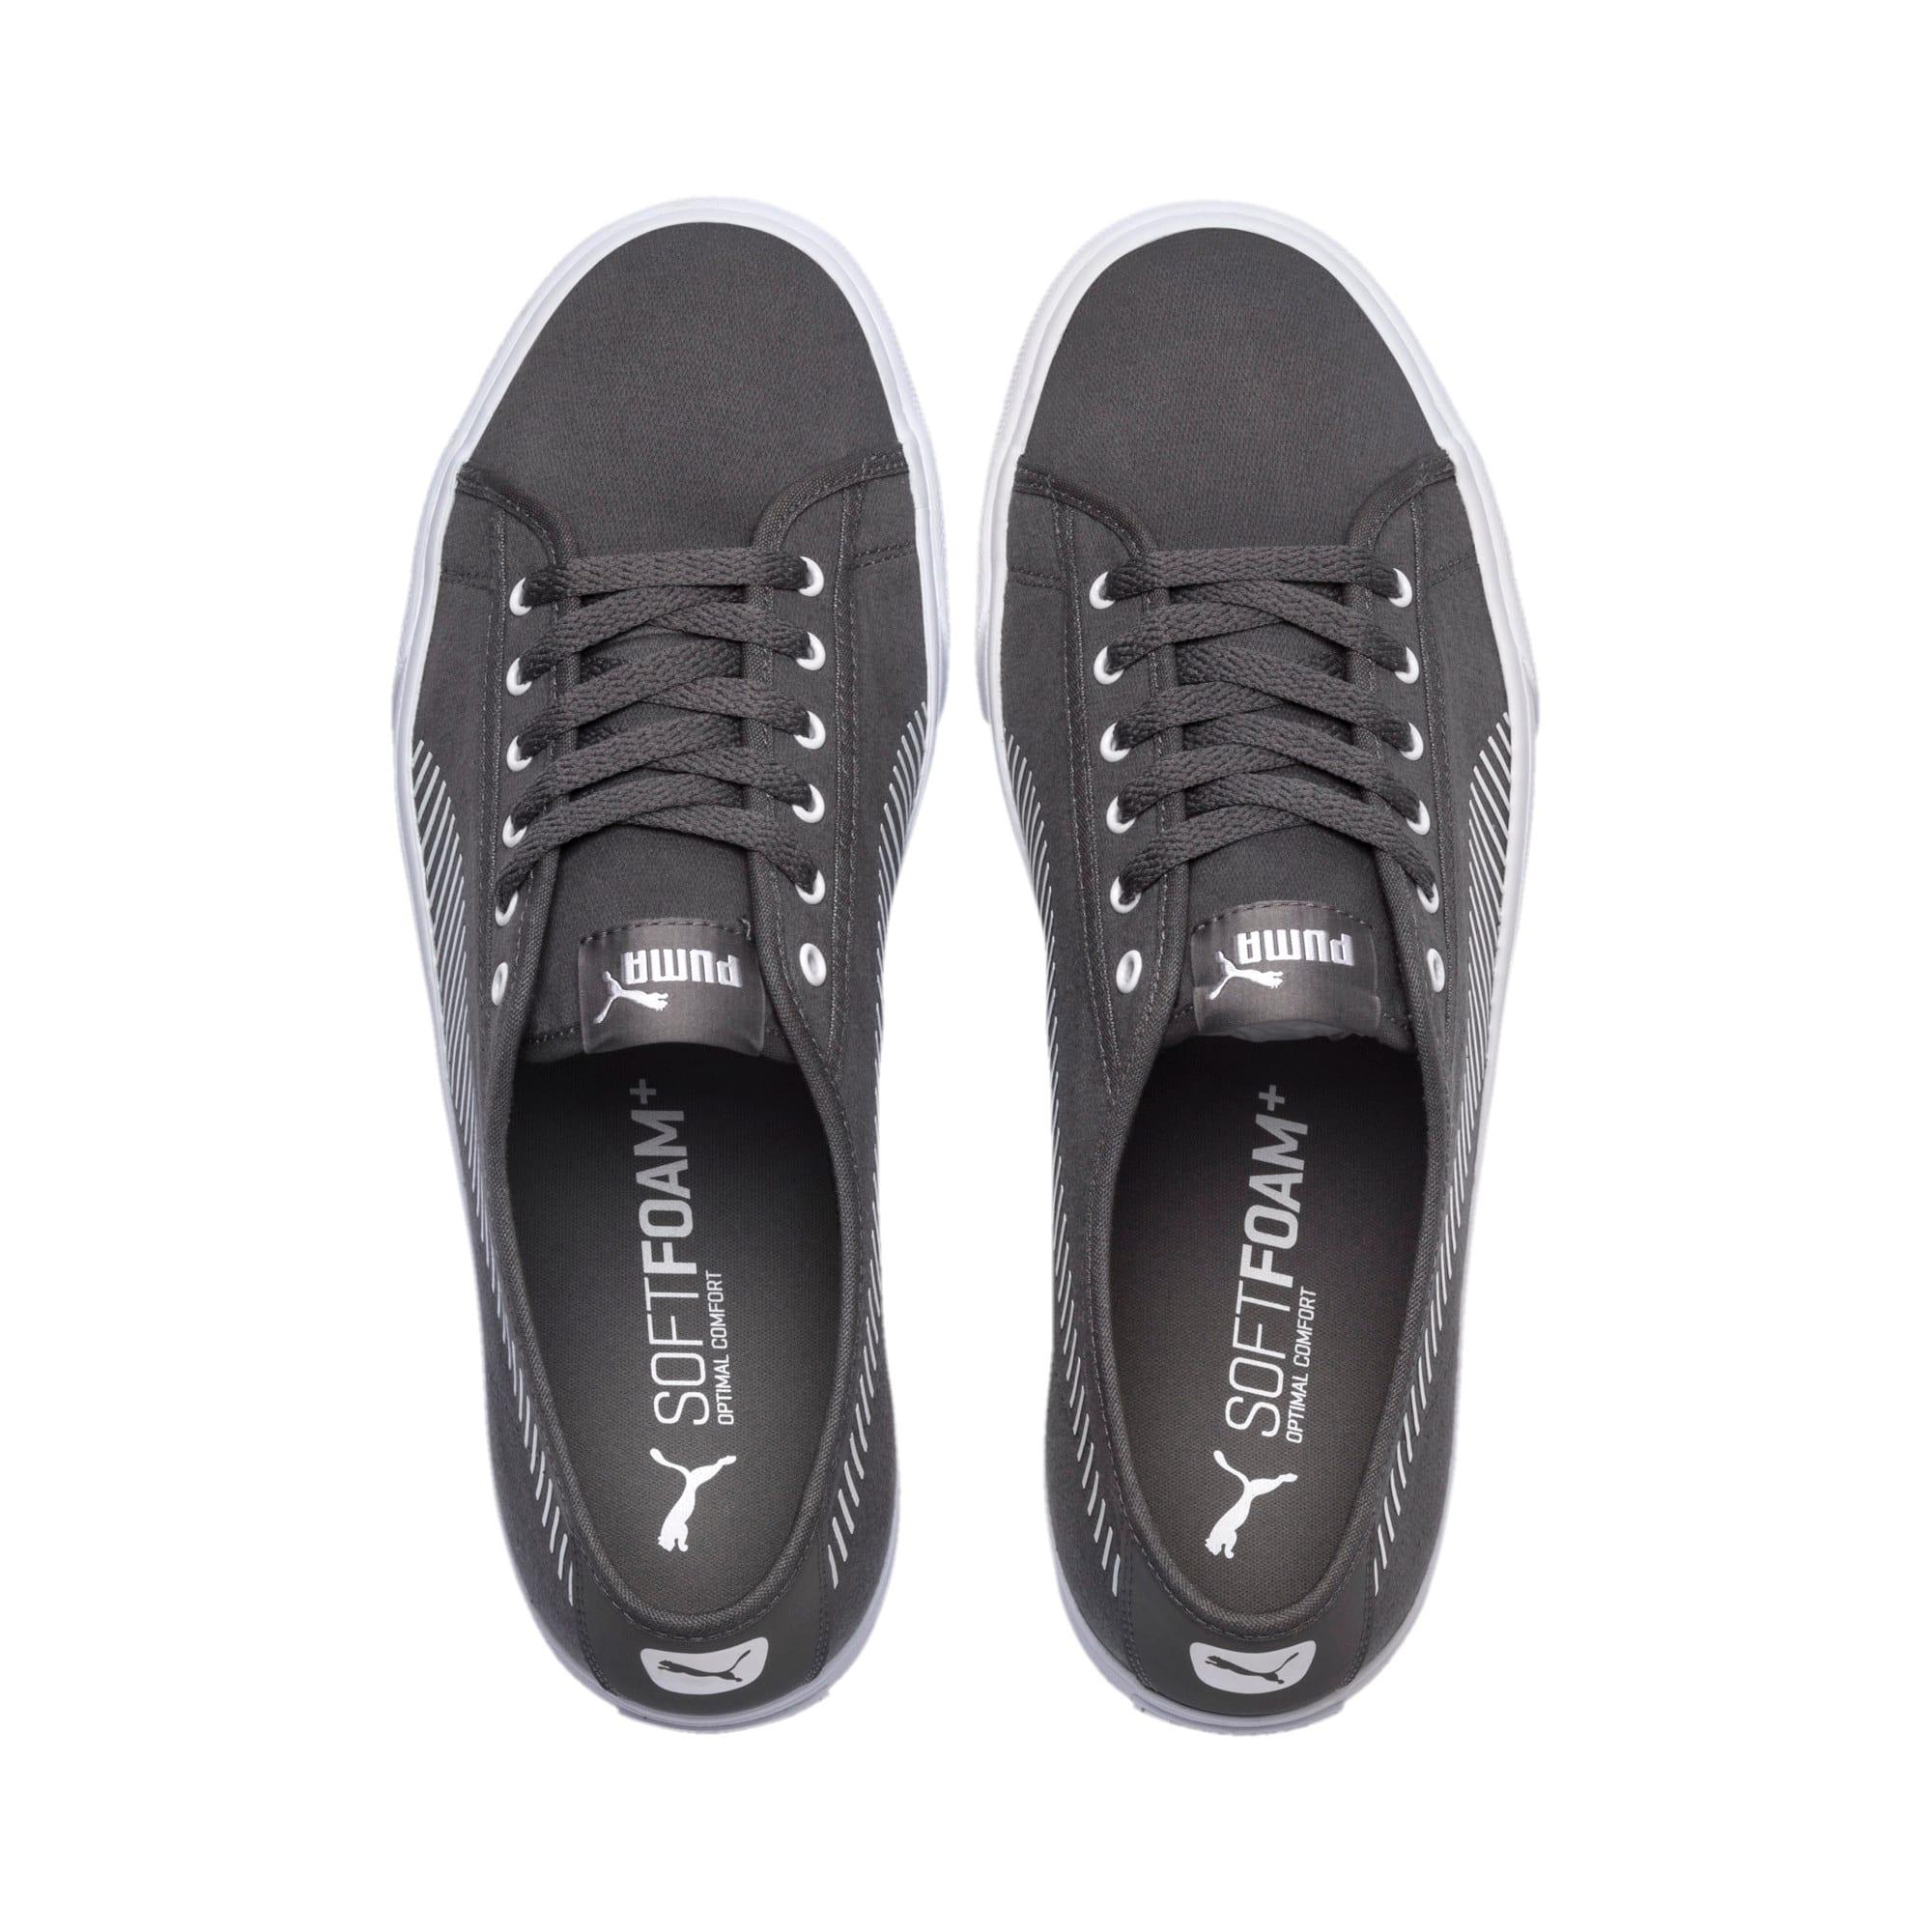 Thumbnail 6 of Bari Sneakers, Charcoal Gray-Puma White, medium